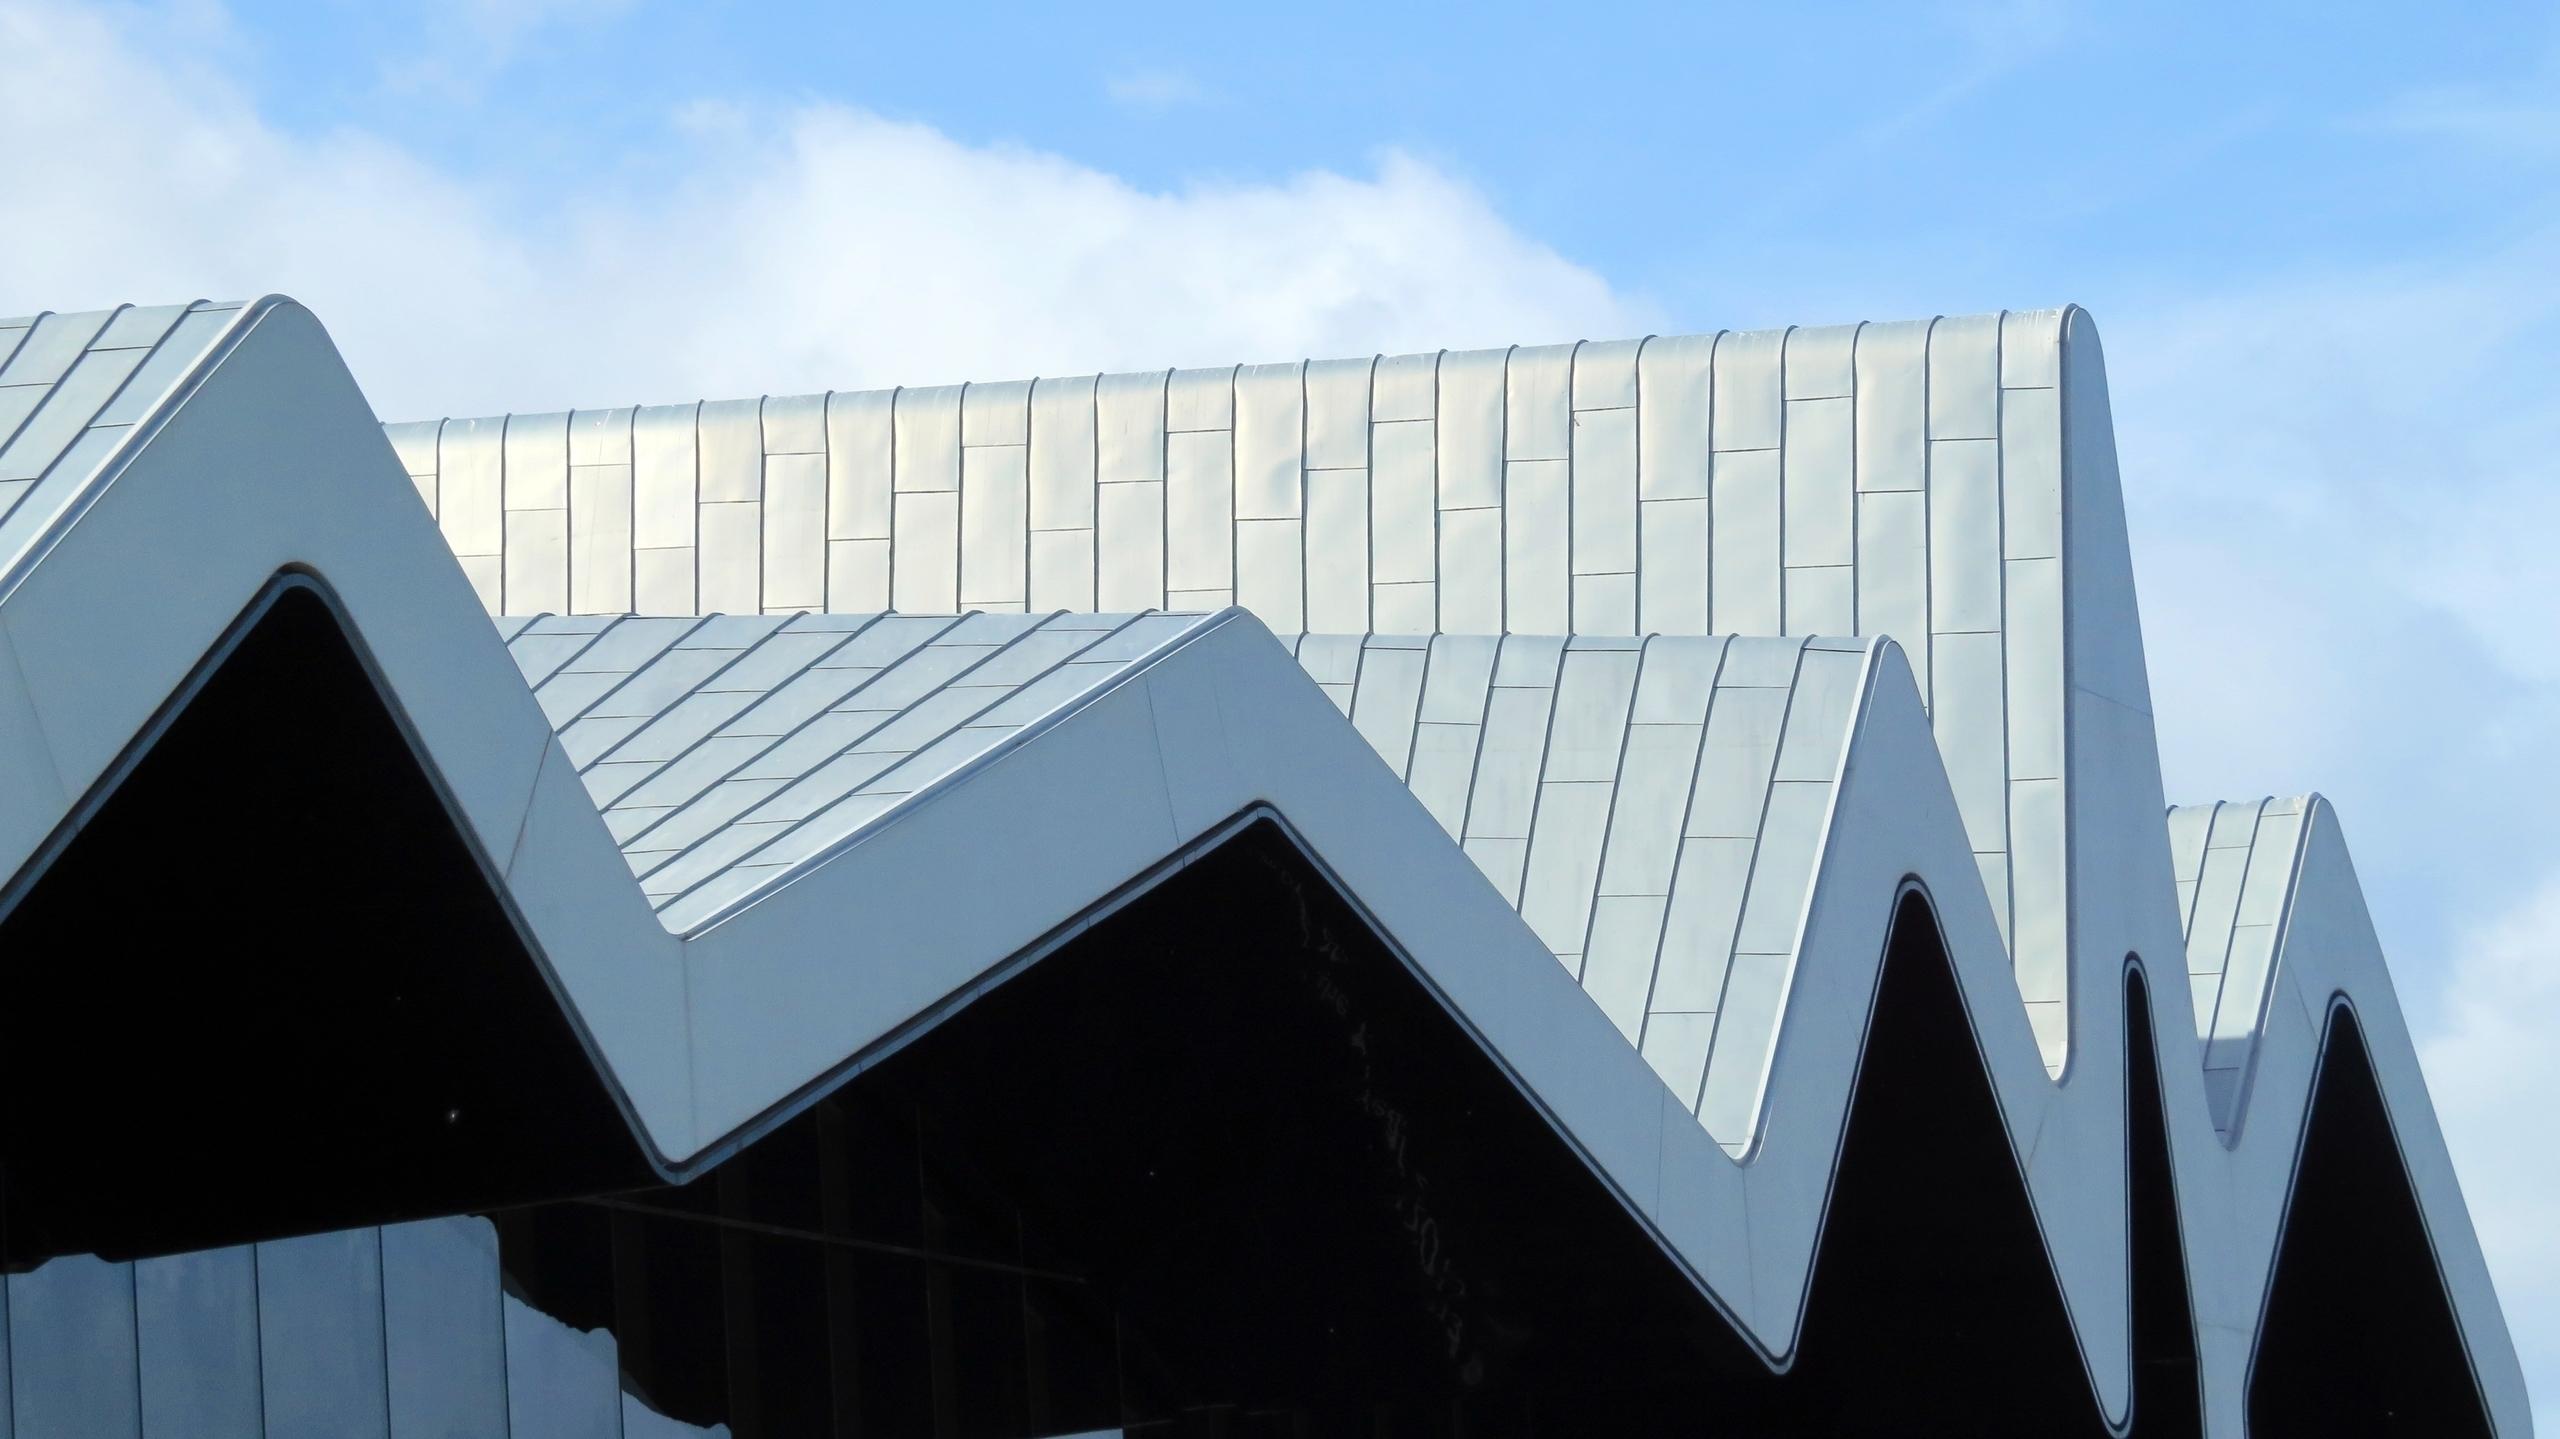 Roof Riverside museum - Glasgow - zondervrees | ello